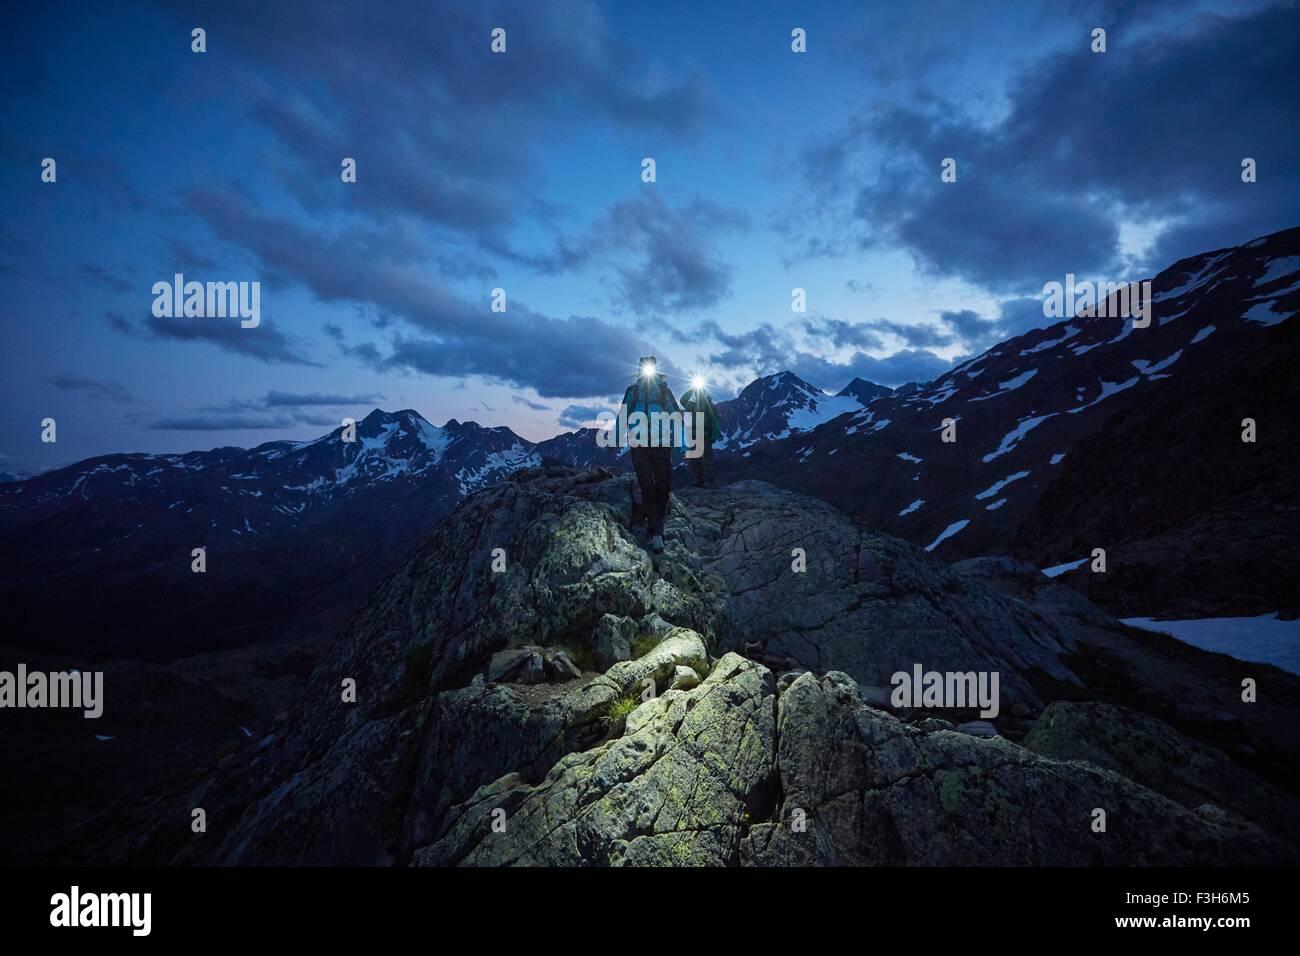 Young couple hiking at night wearing headlamps, Val Senales Glacier, Val Senales, South Tyrol, Italy - Stock Image